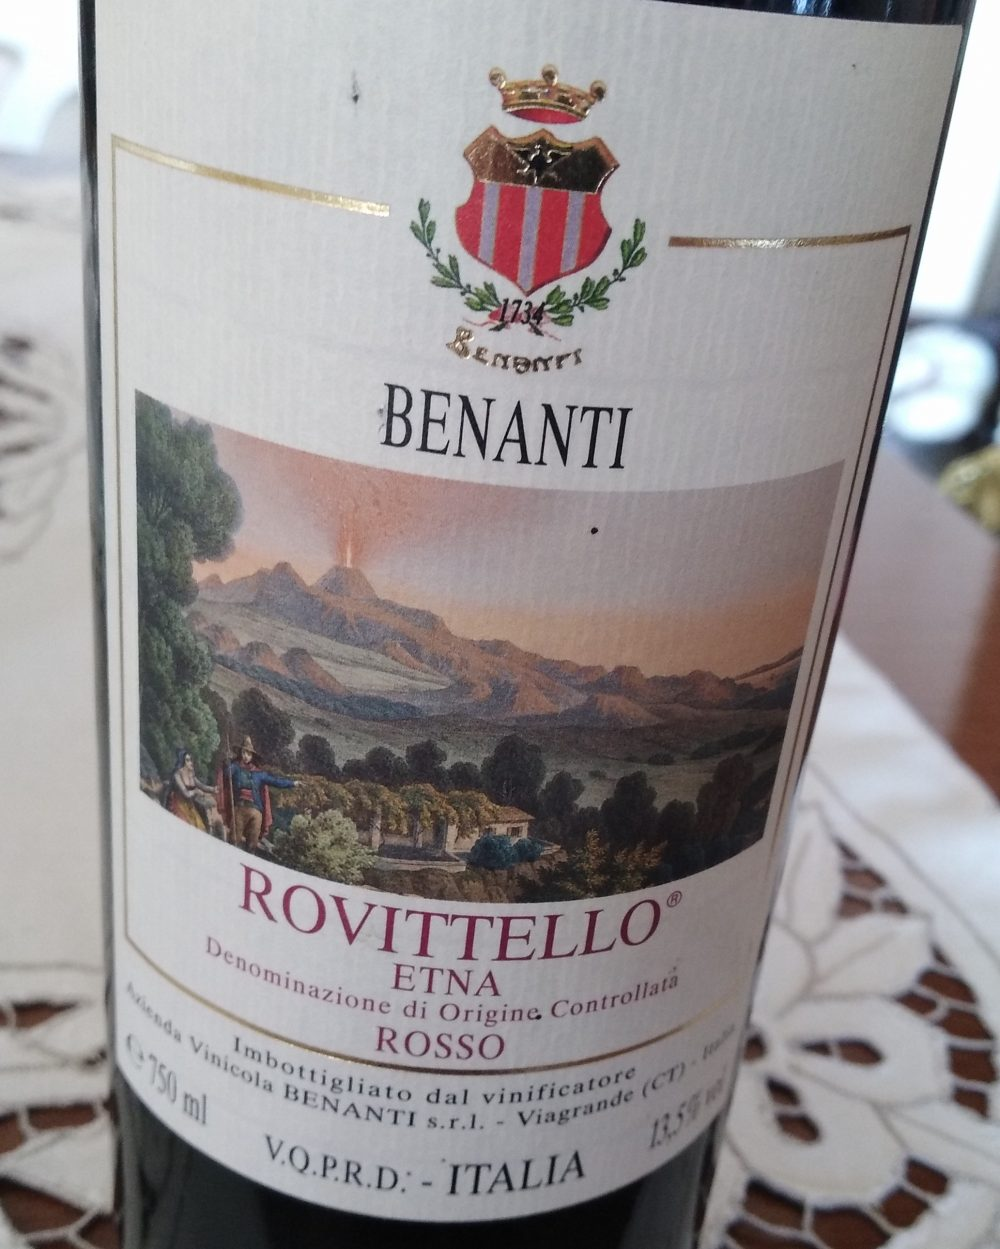 Rovittello Etna Rosso Doc 2004 Benanti